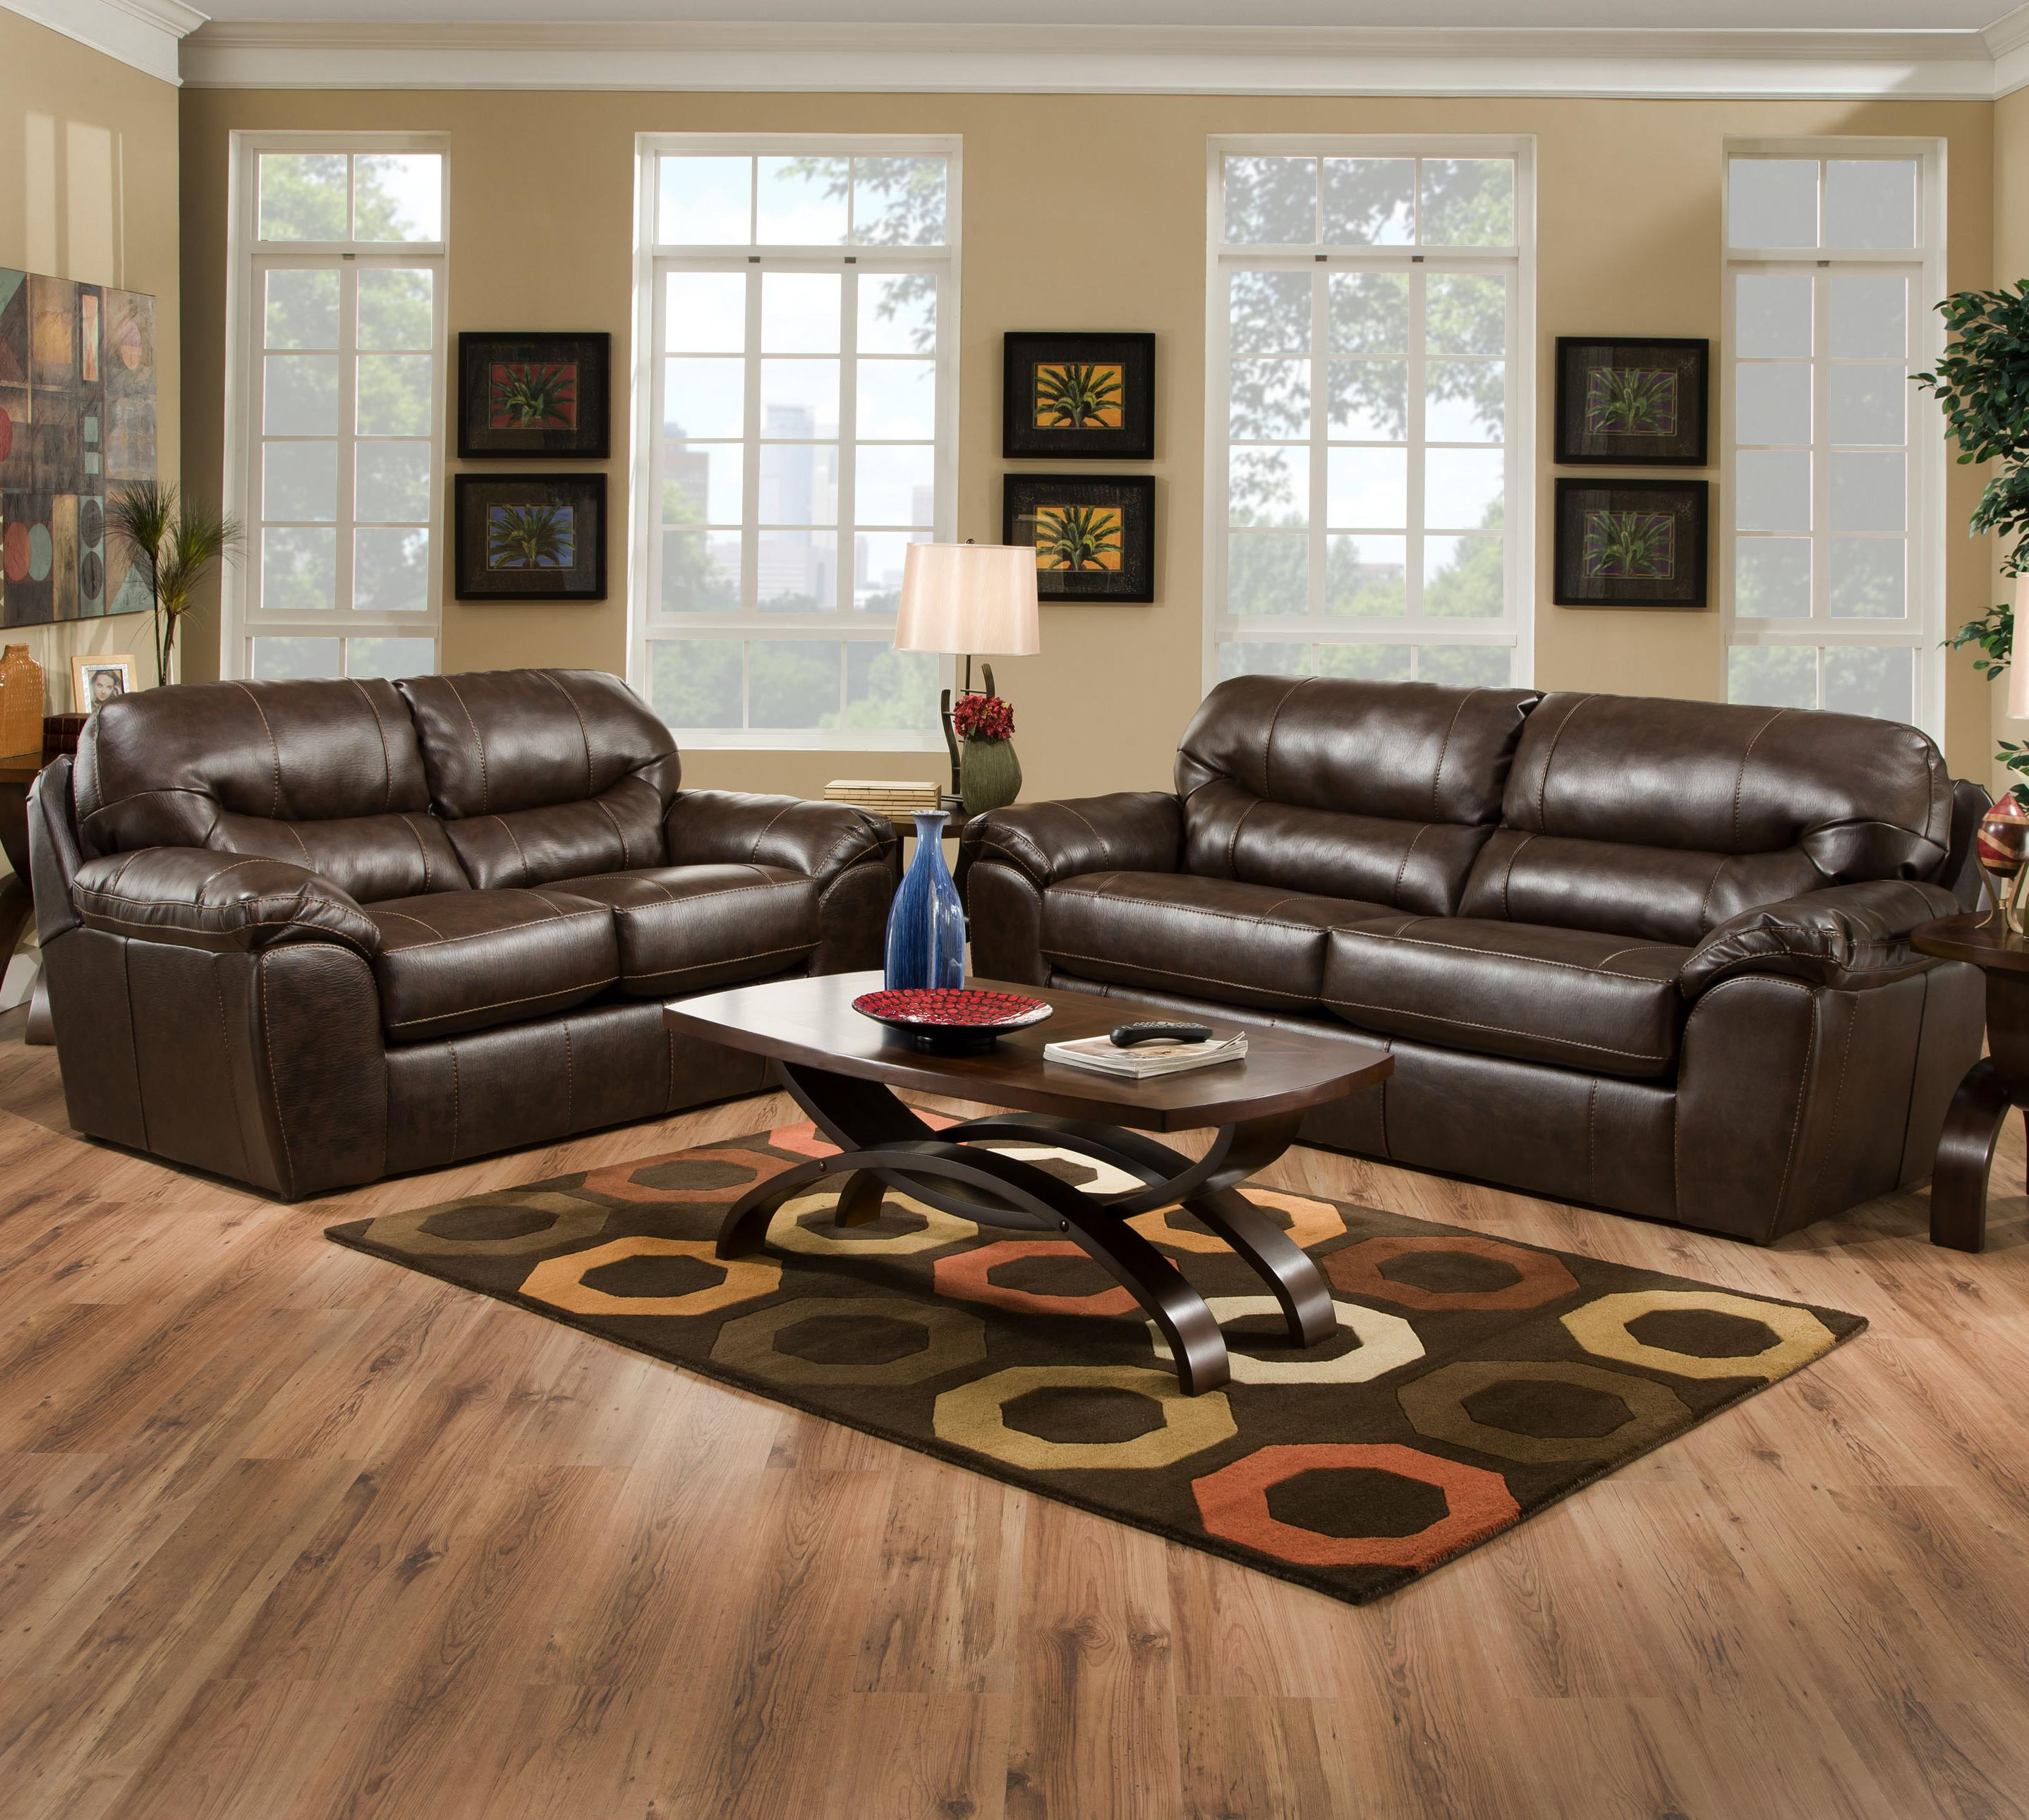 Comfortable sofa for family room for Comfortable family sofa